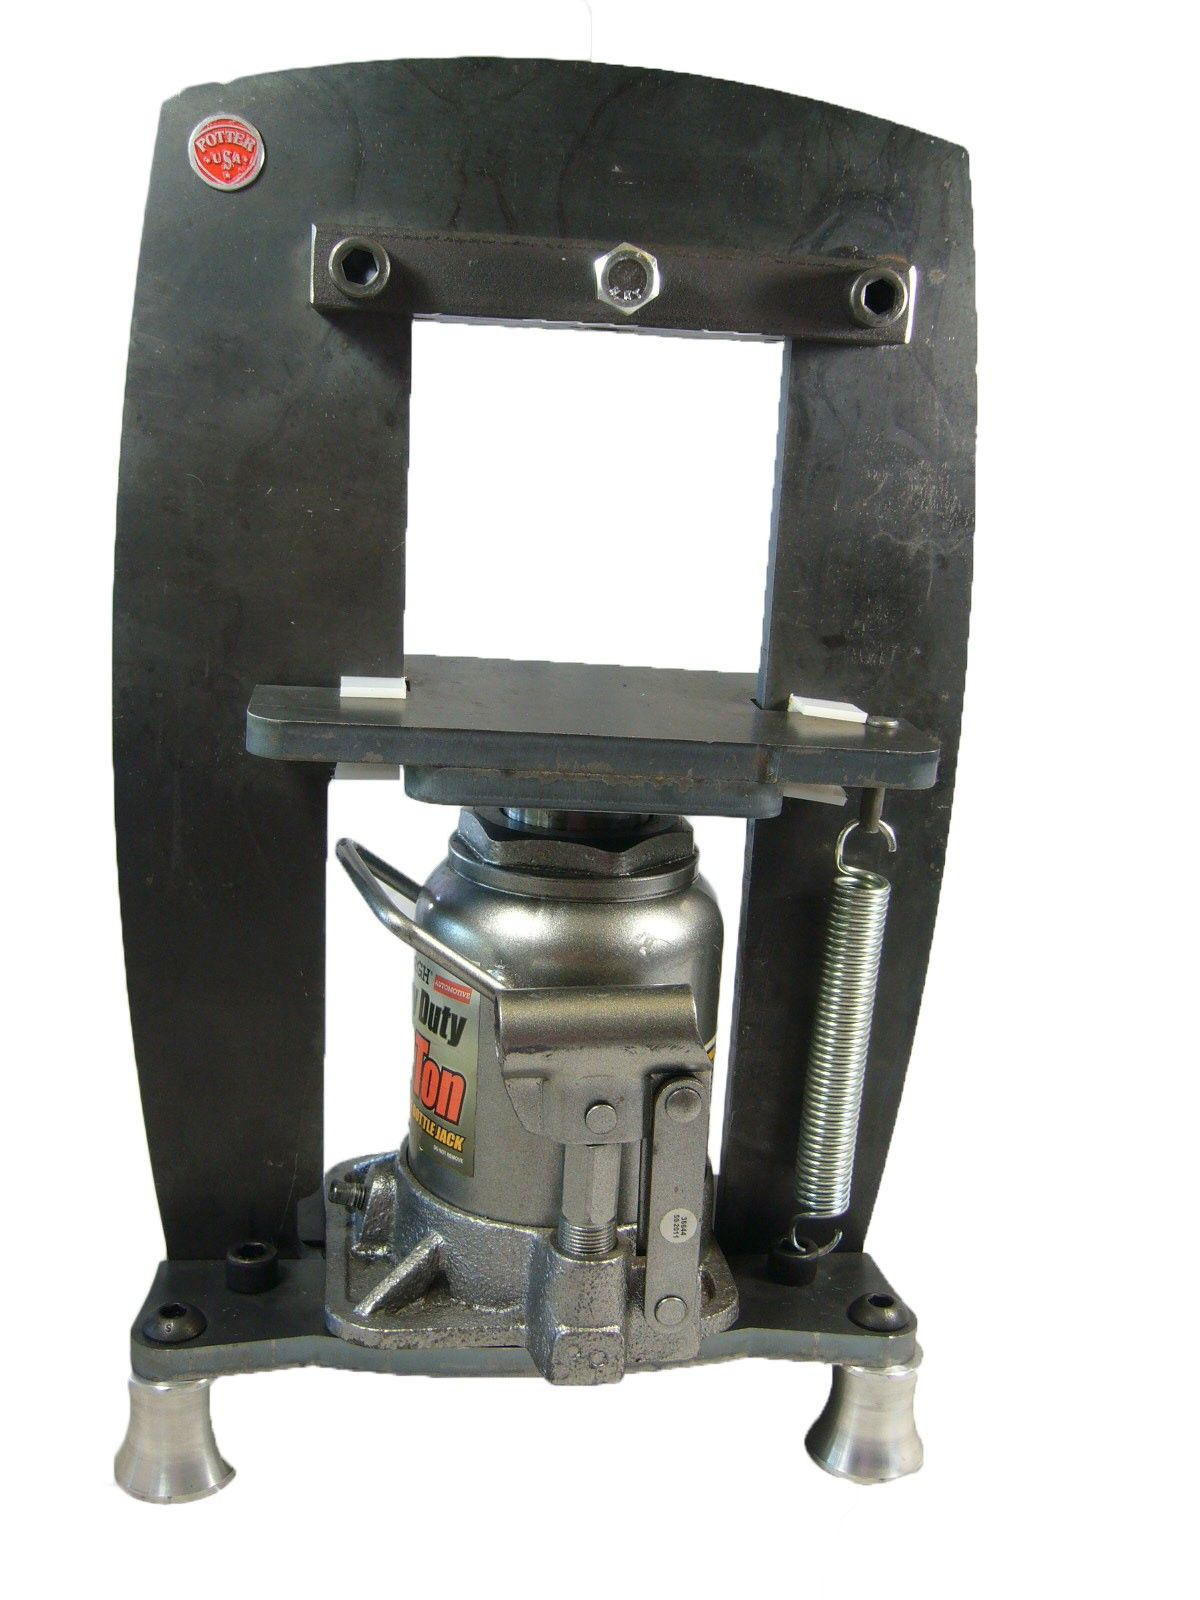 20ton bolt together press Potter USA Metal working